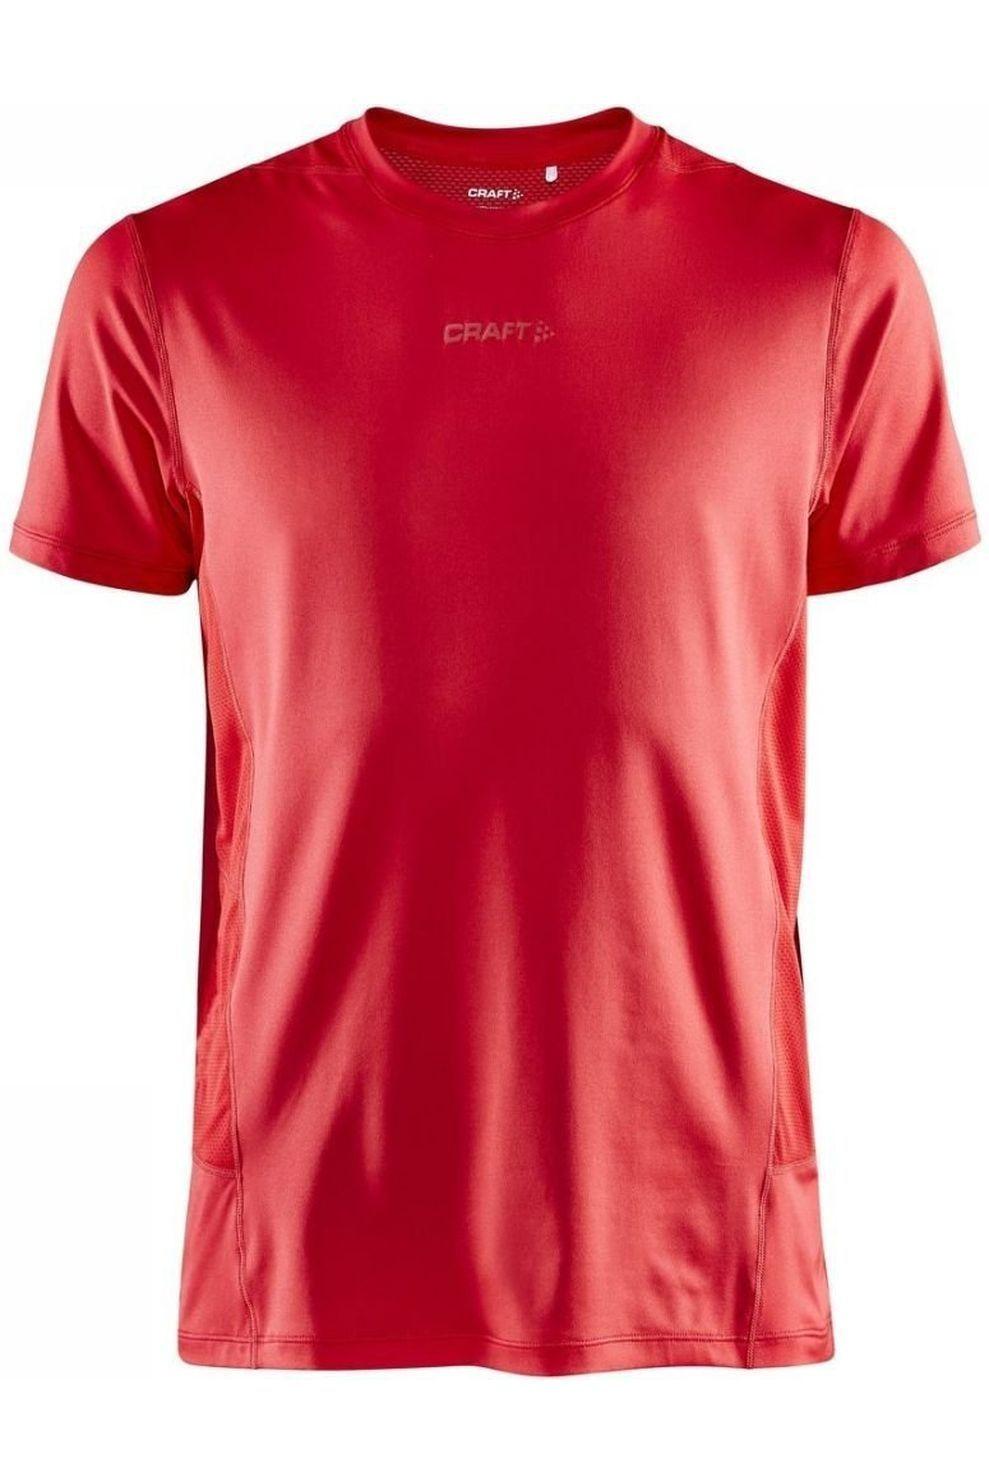 Craft T-Shirt Adv Essence Ss Tee M voor heren - Rood - Maten: XS, S